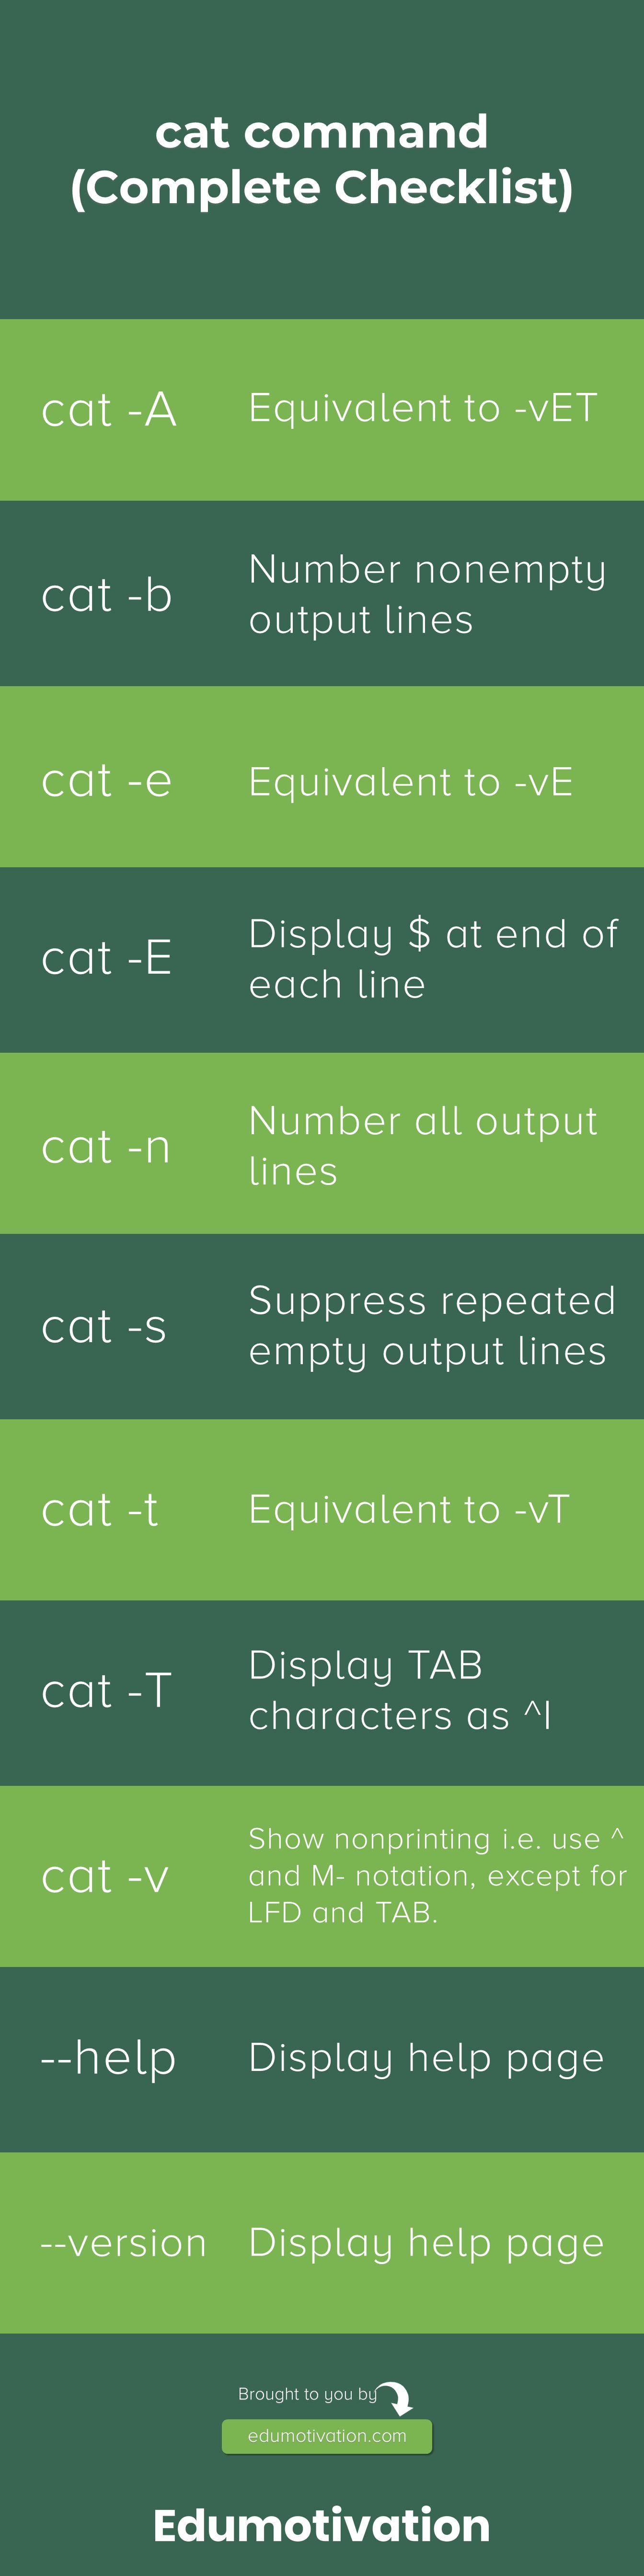 Cat Command Complete Checklist